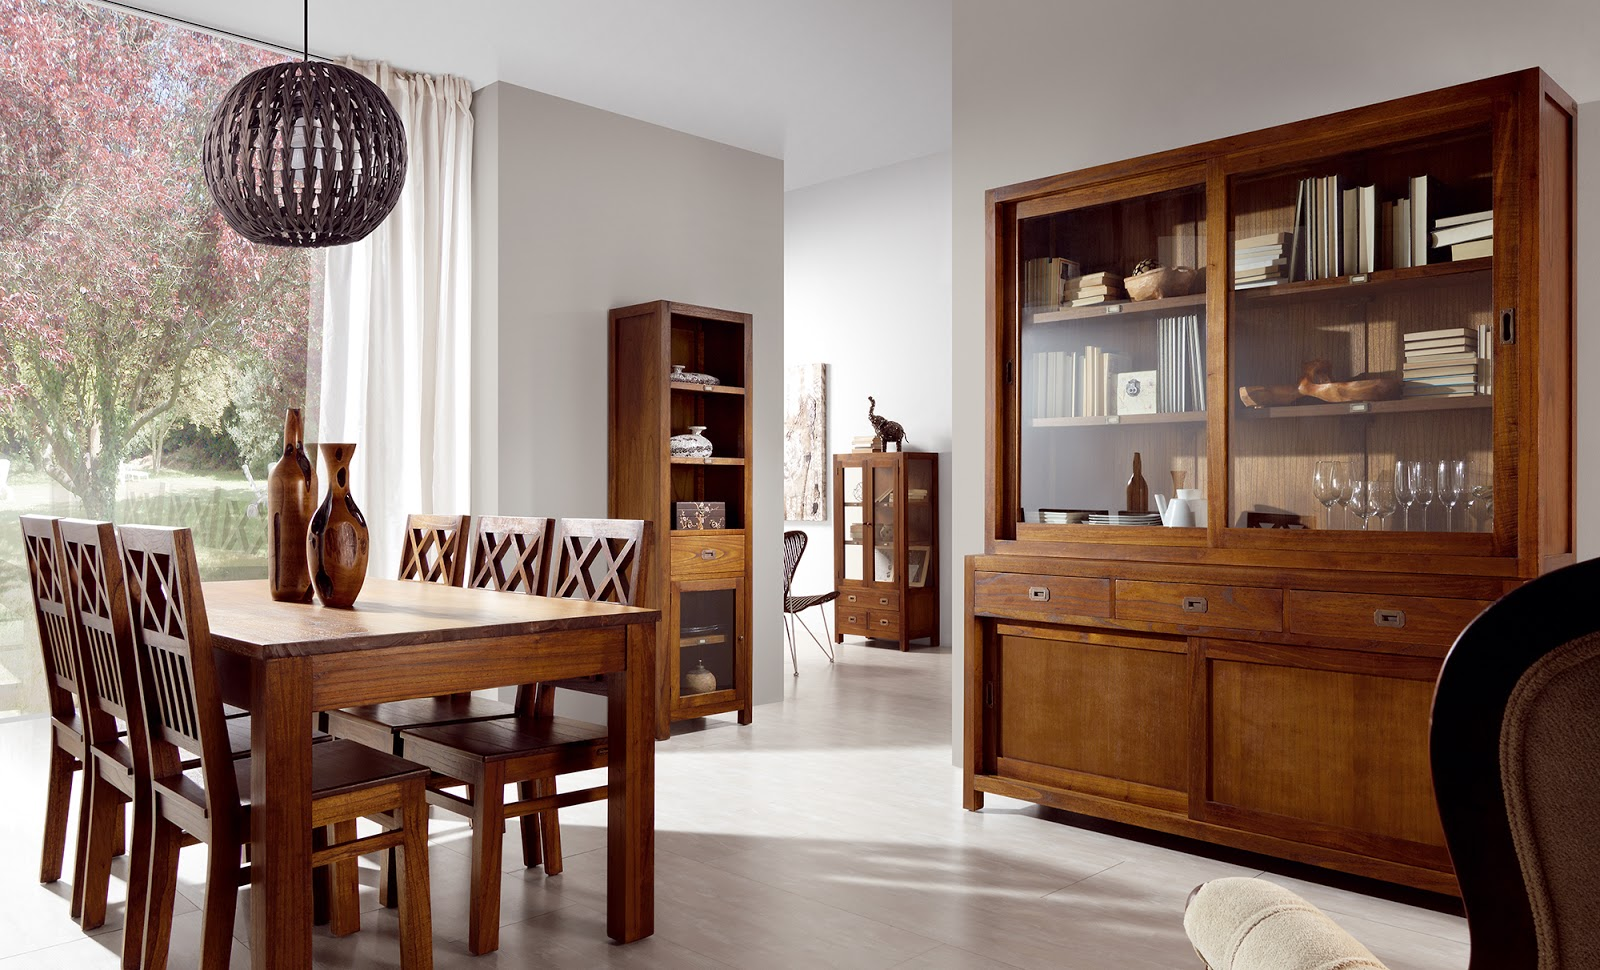 Muebles de comedor 10 comedores con vitrina - Muebles modernos para comedor ...